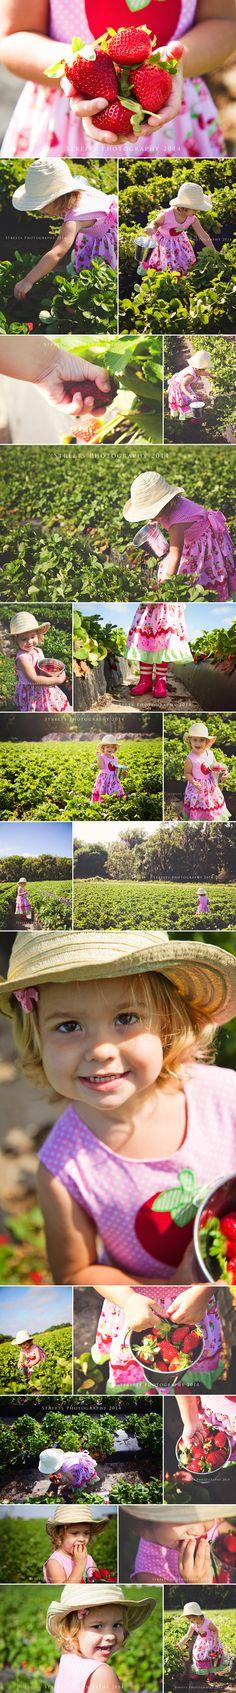 Strawberry Photo Shoot, Little Girl Picking Strawberries, Strawberry Field, Girl Photo Ideas, Strawberry Shortcake Birthday